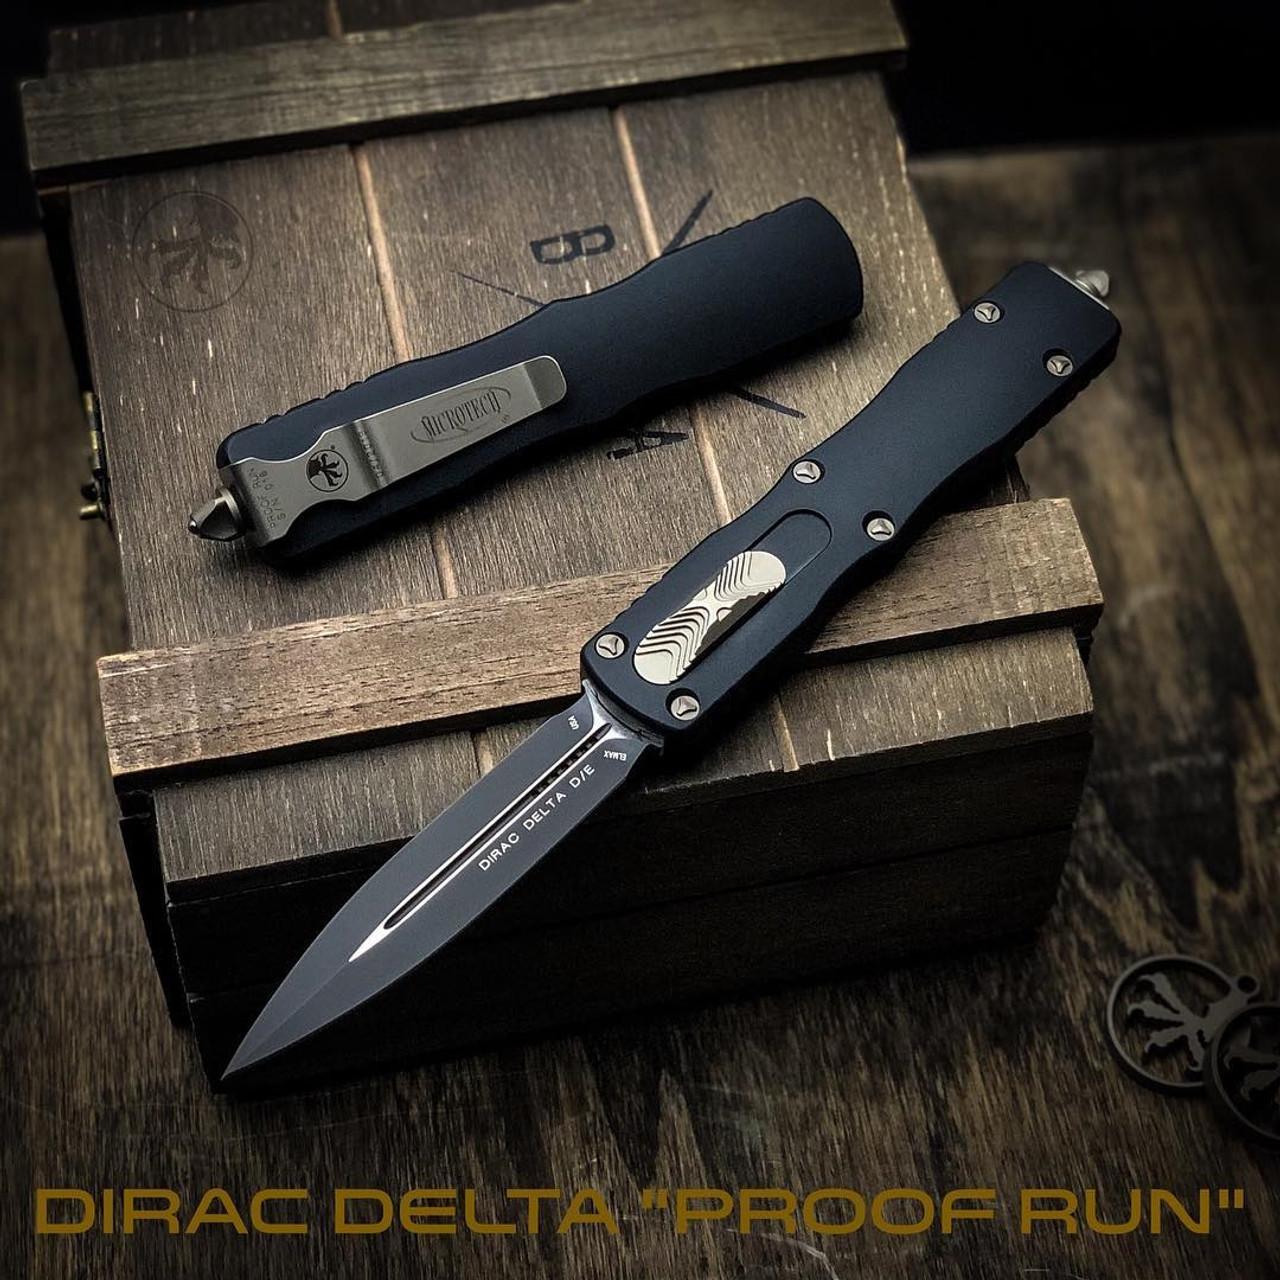 Microtech Dirac Delta Dagger OTF Auto Knife, Black Blade [Proof Run]